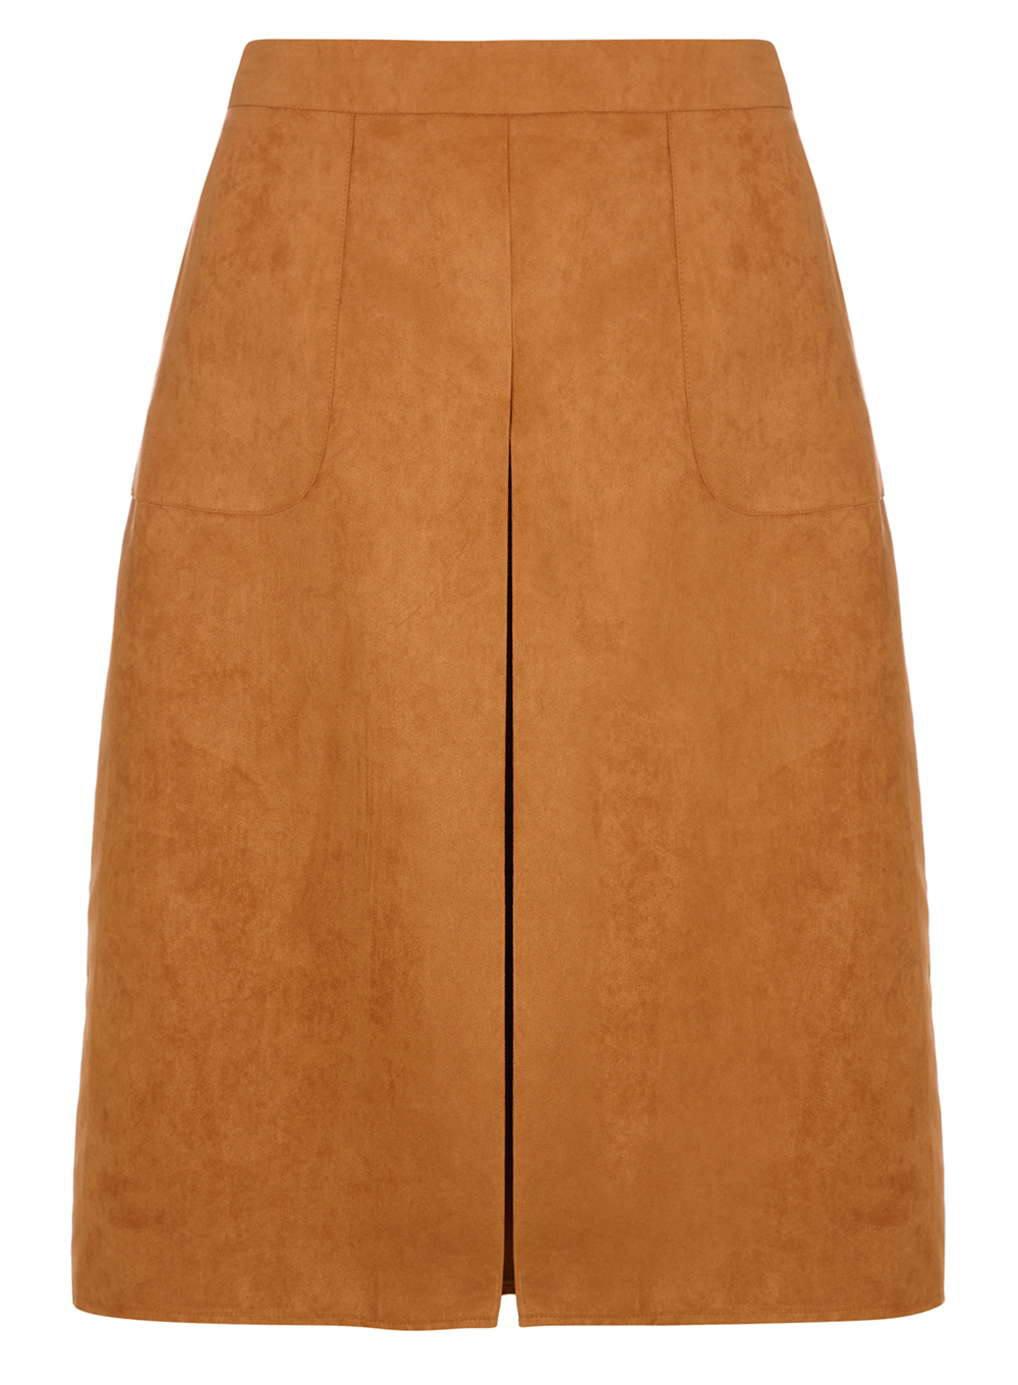 dorothy perkins suedette pocket midi skirt